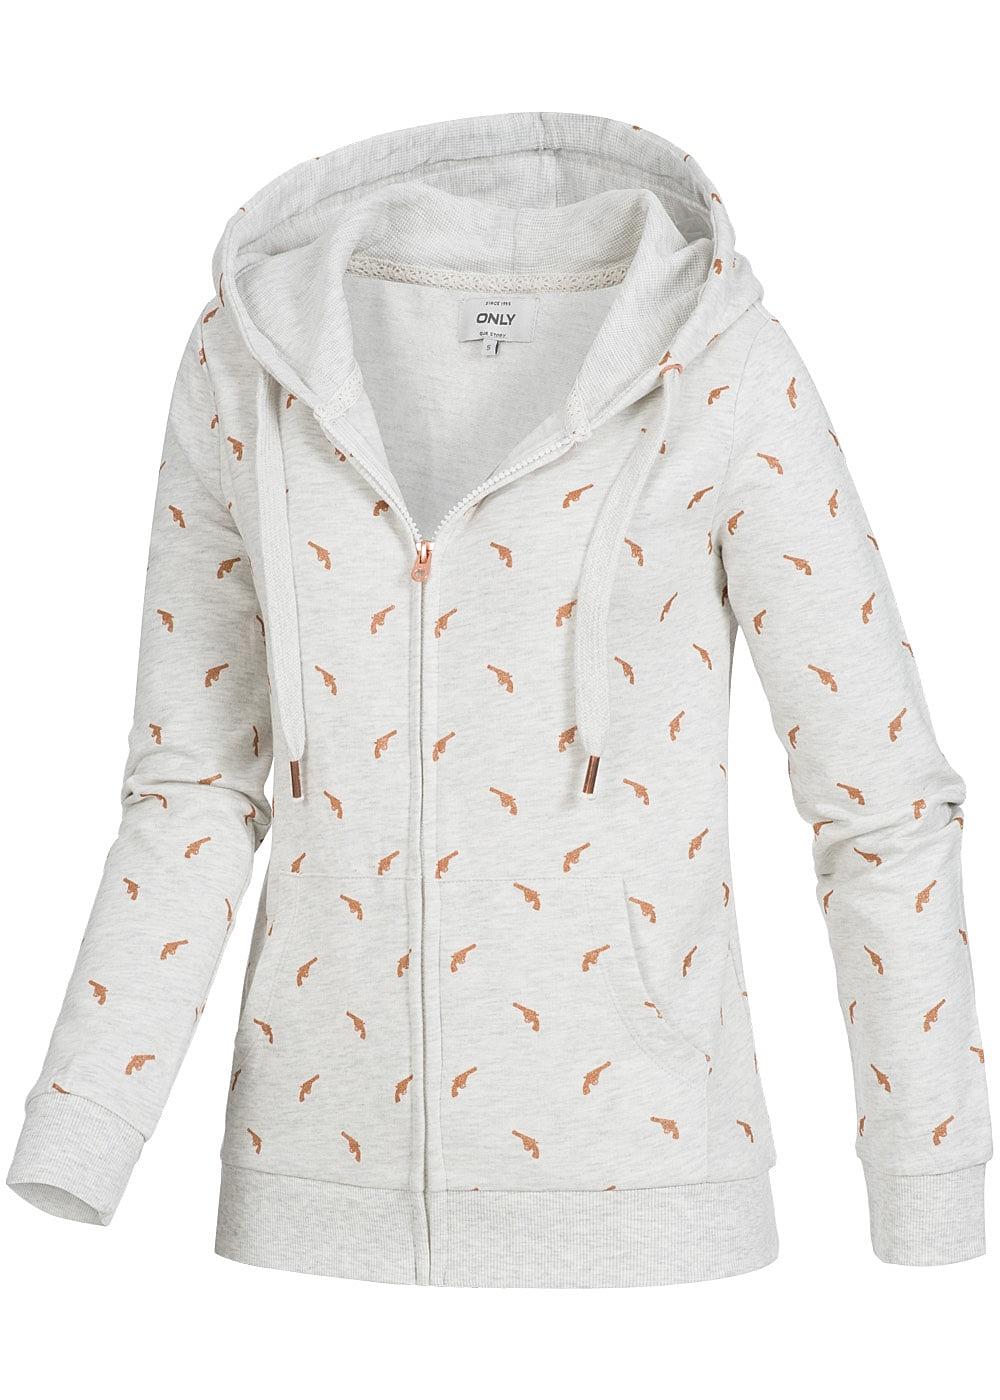 only damen zip hoodie kapuze 2 taschen pistolen muster oatmeal grau melange 77onlineshop. Black Bedroom Furniture Sets. Home Design Ideas